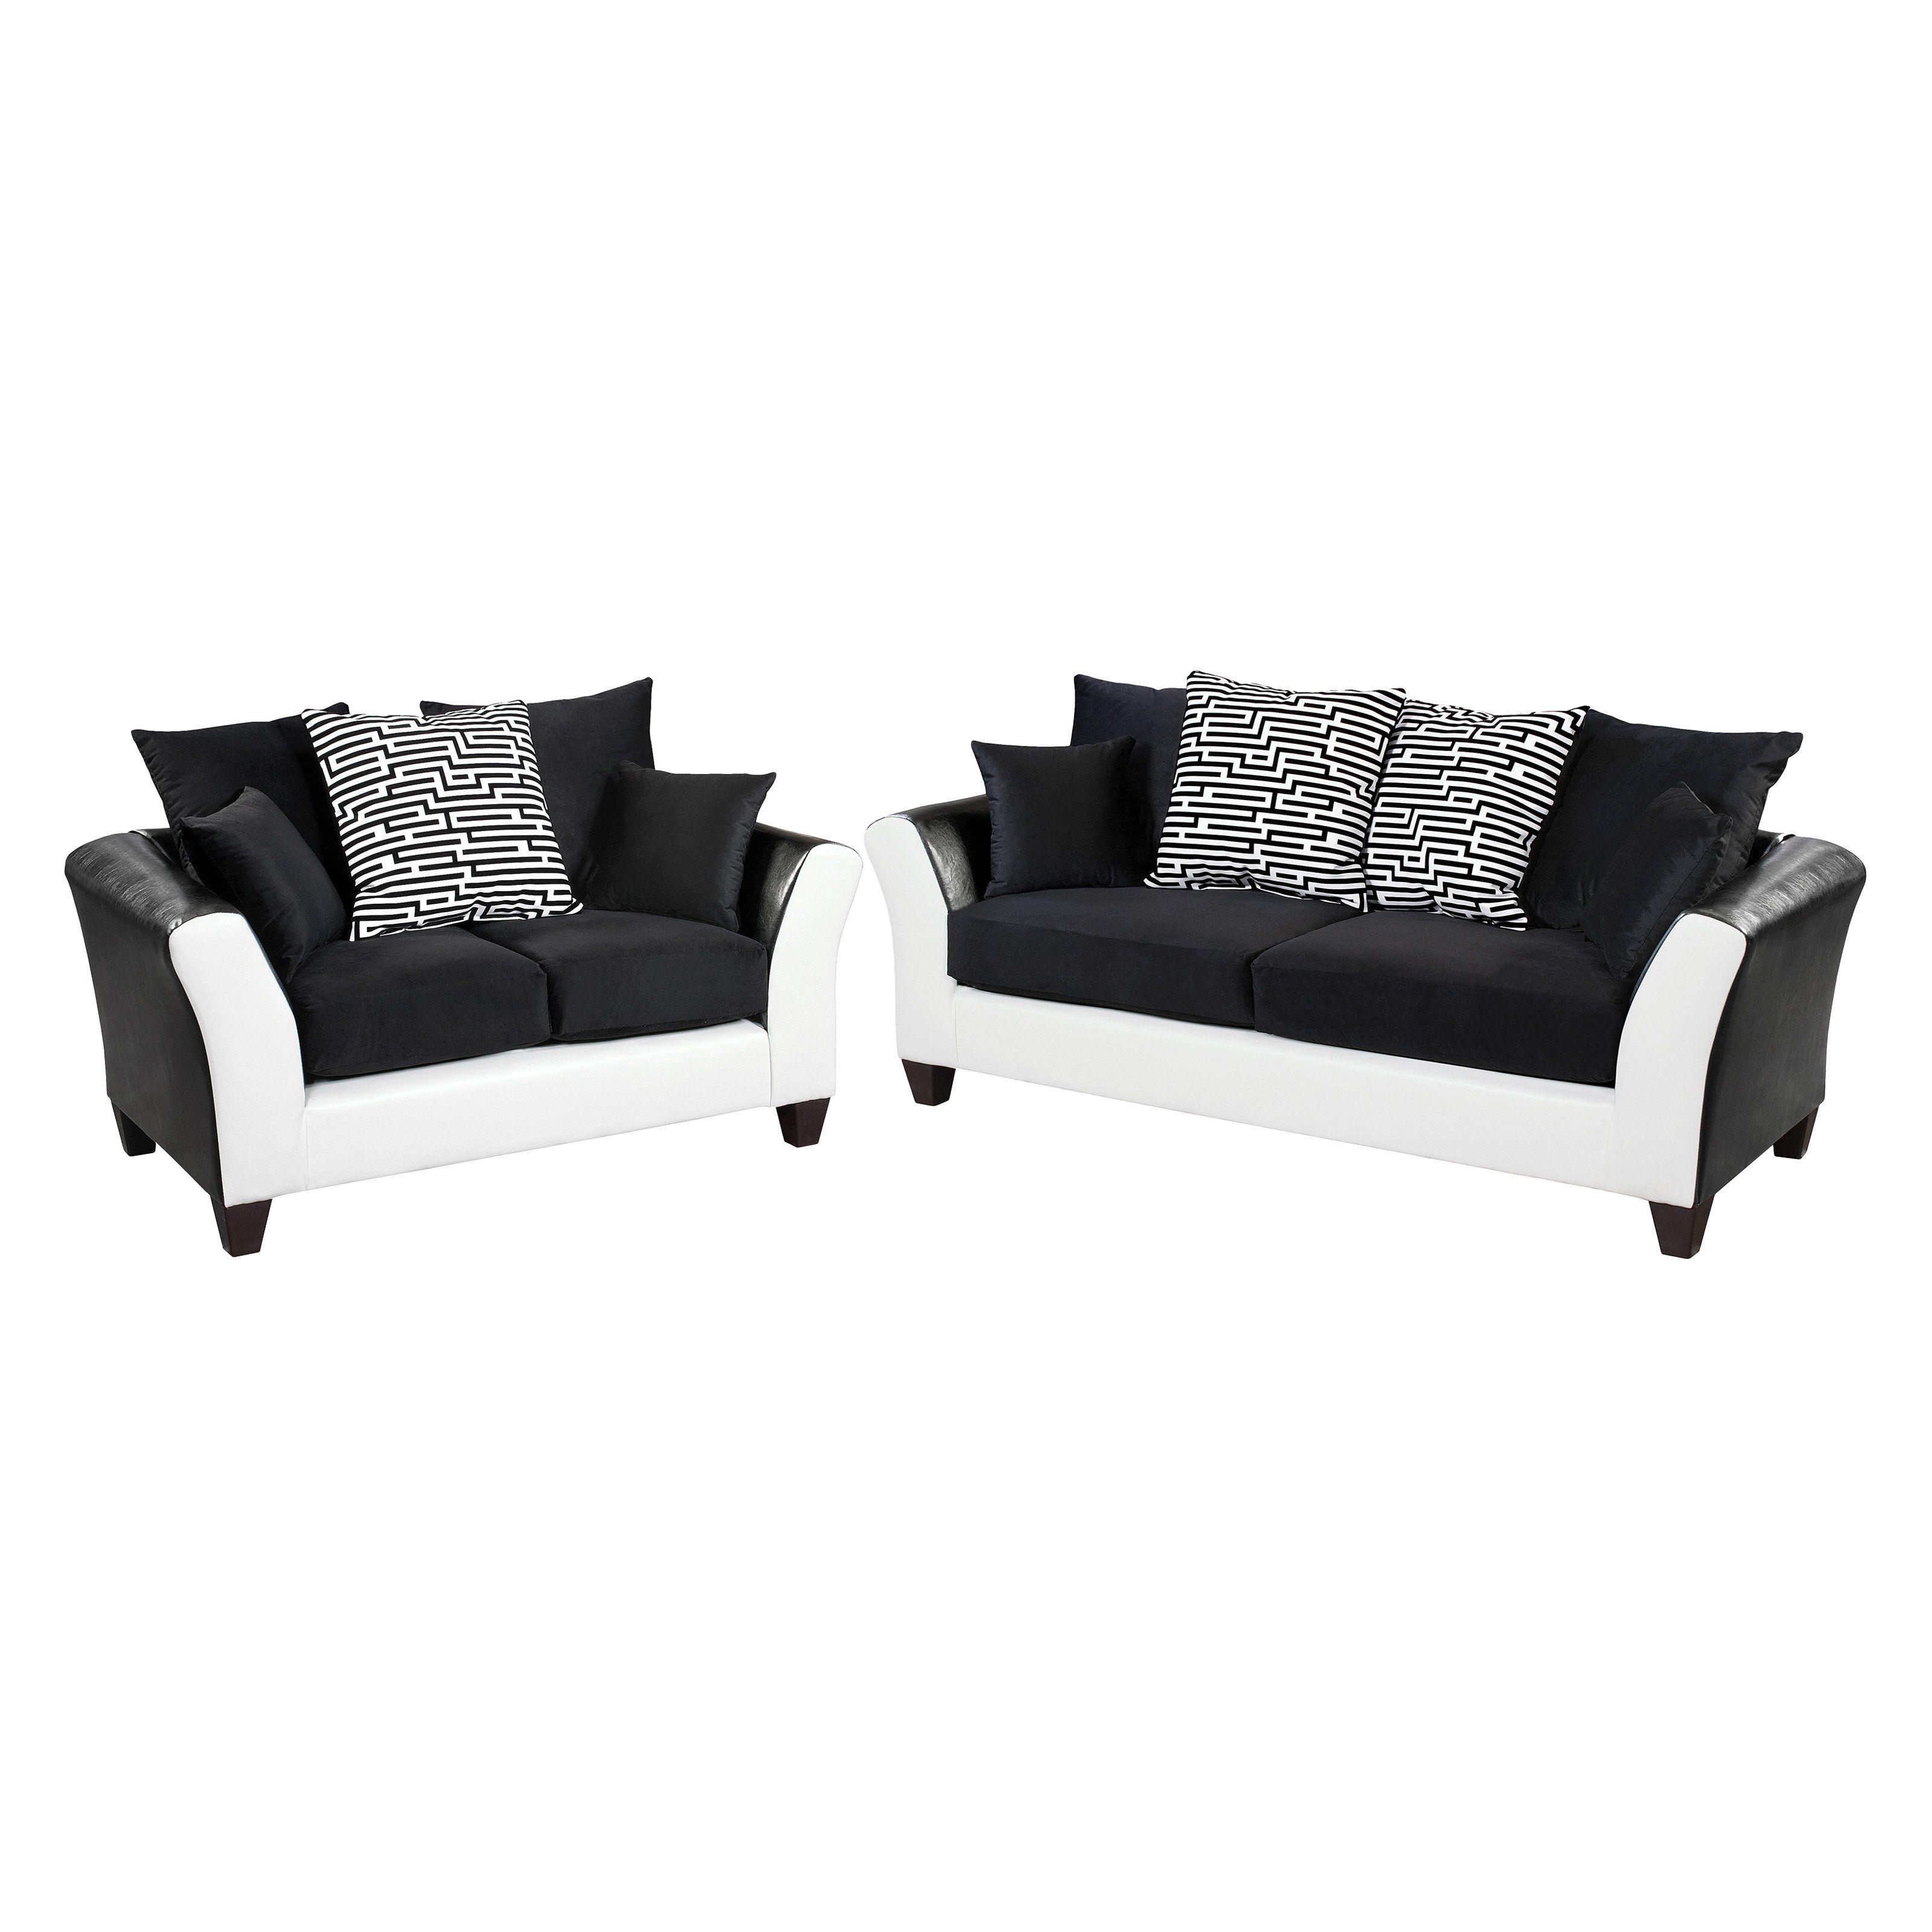 Flash furniture riverstone implosion velvet loveseat and sofa set